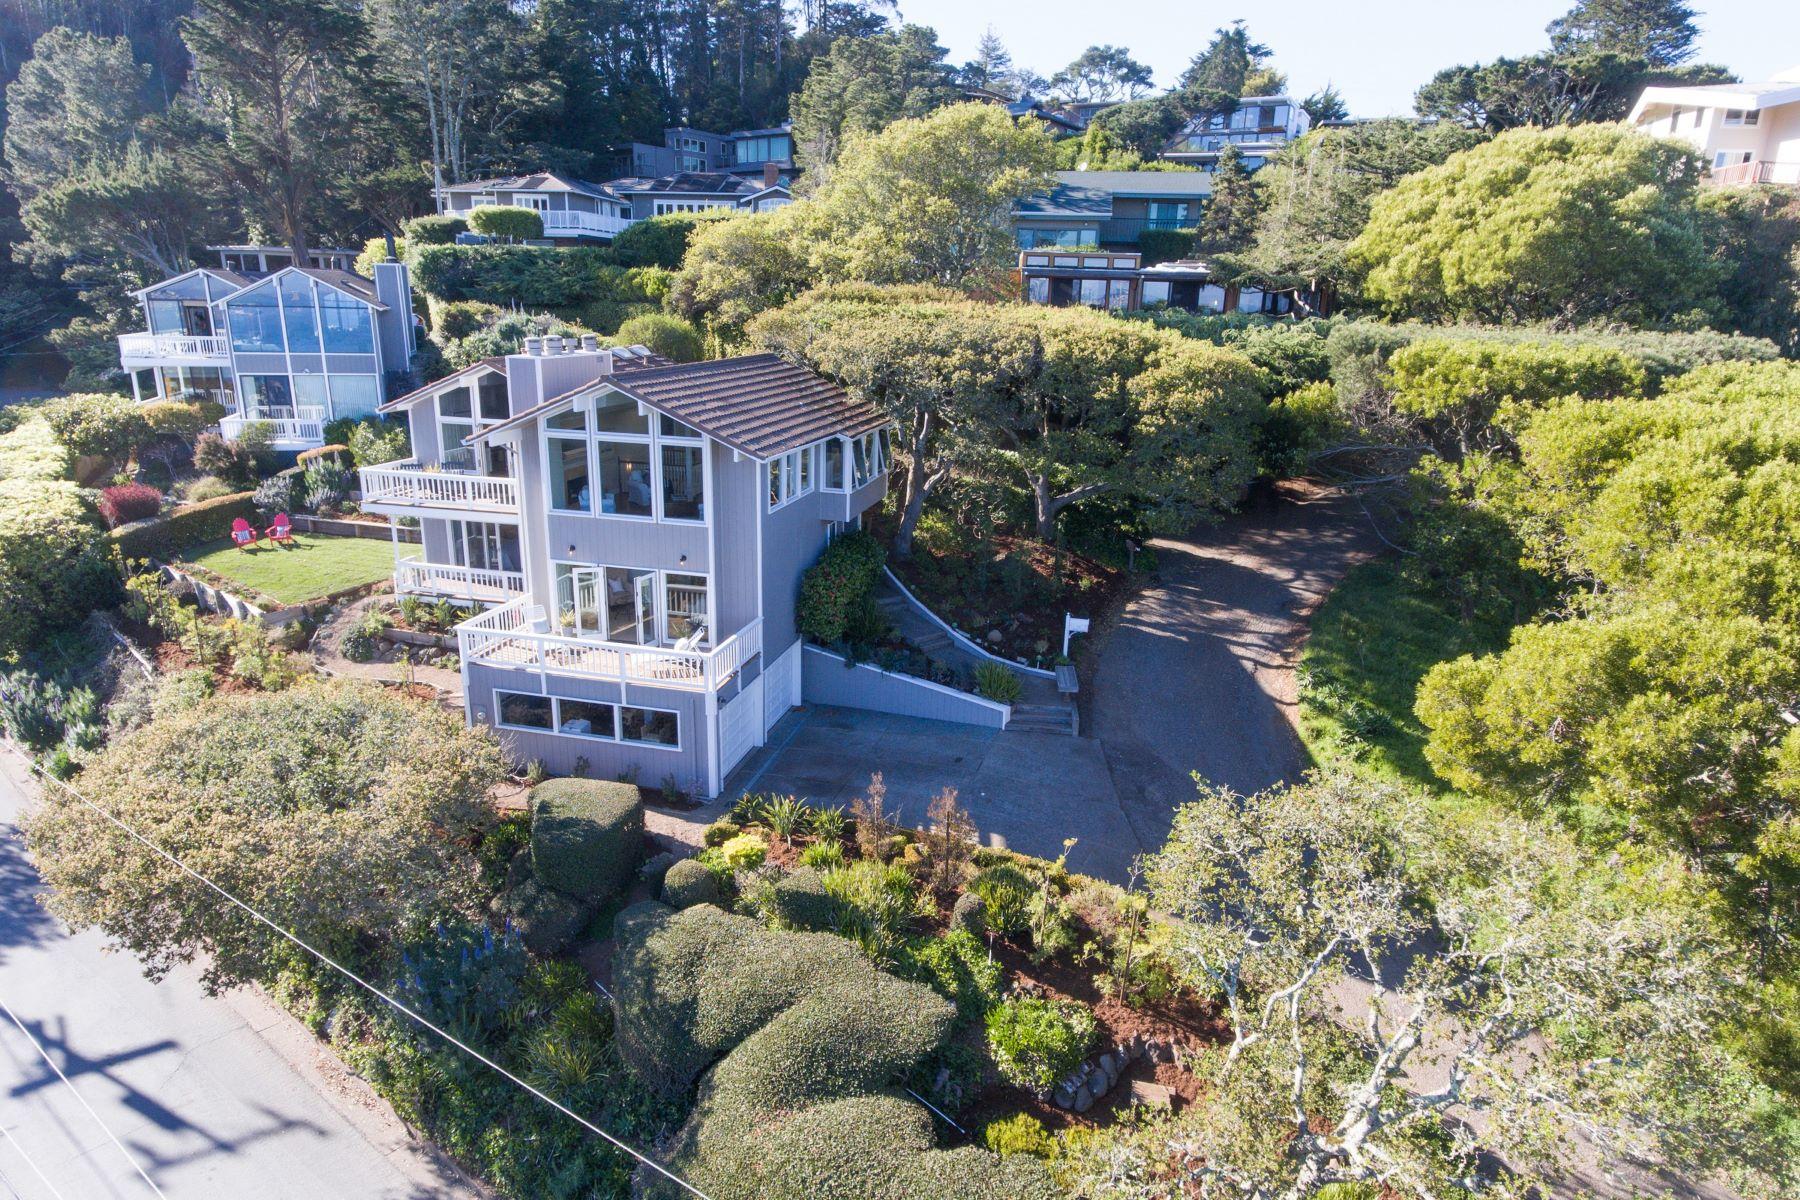 Single Family Home for Sale at Entertaining Sausalito Views 114 Prospect Avenue Sausalito, California 94965 United States